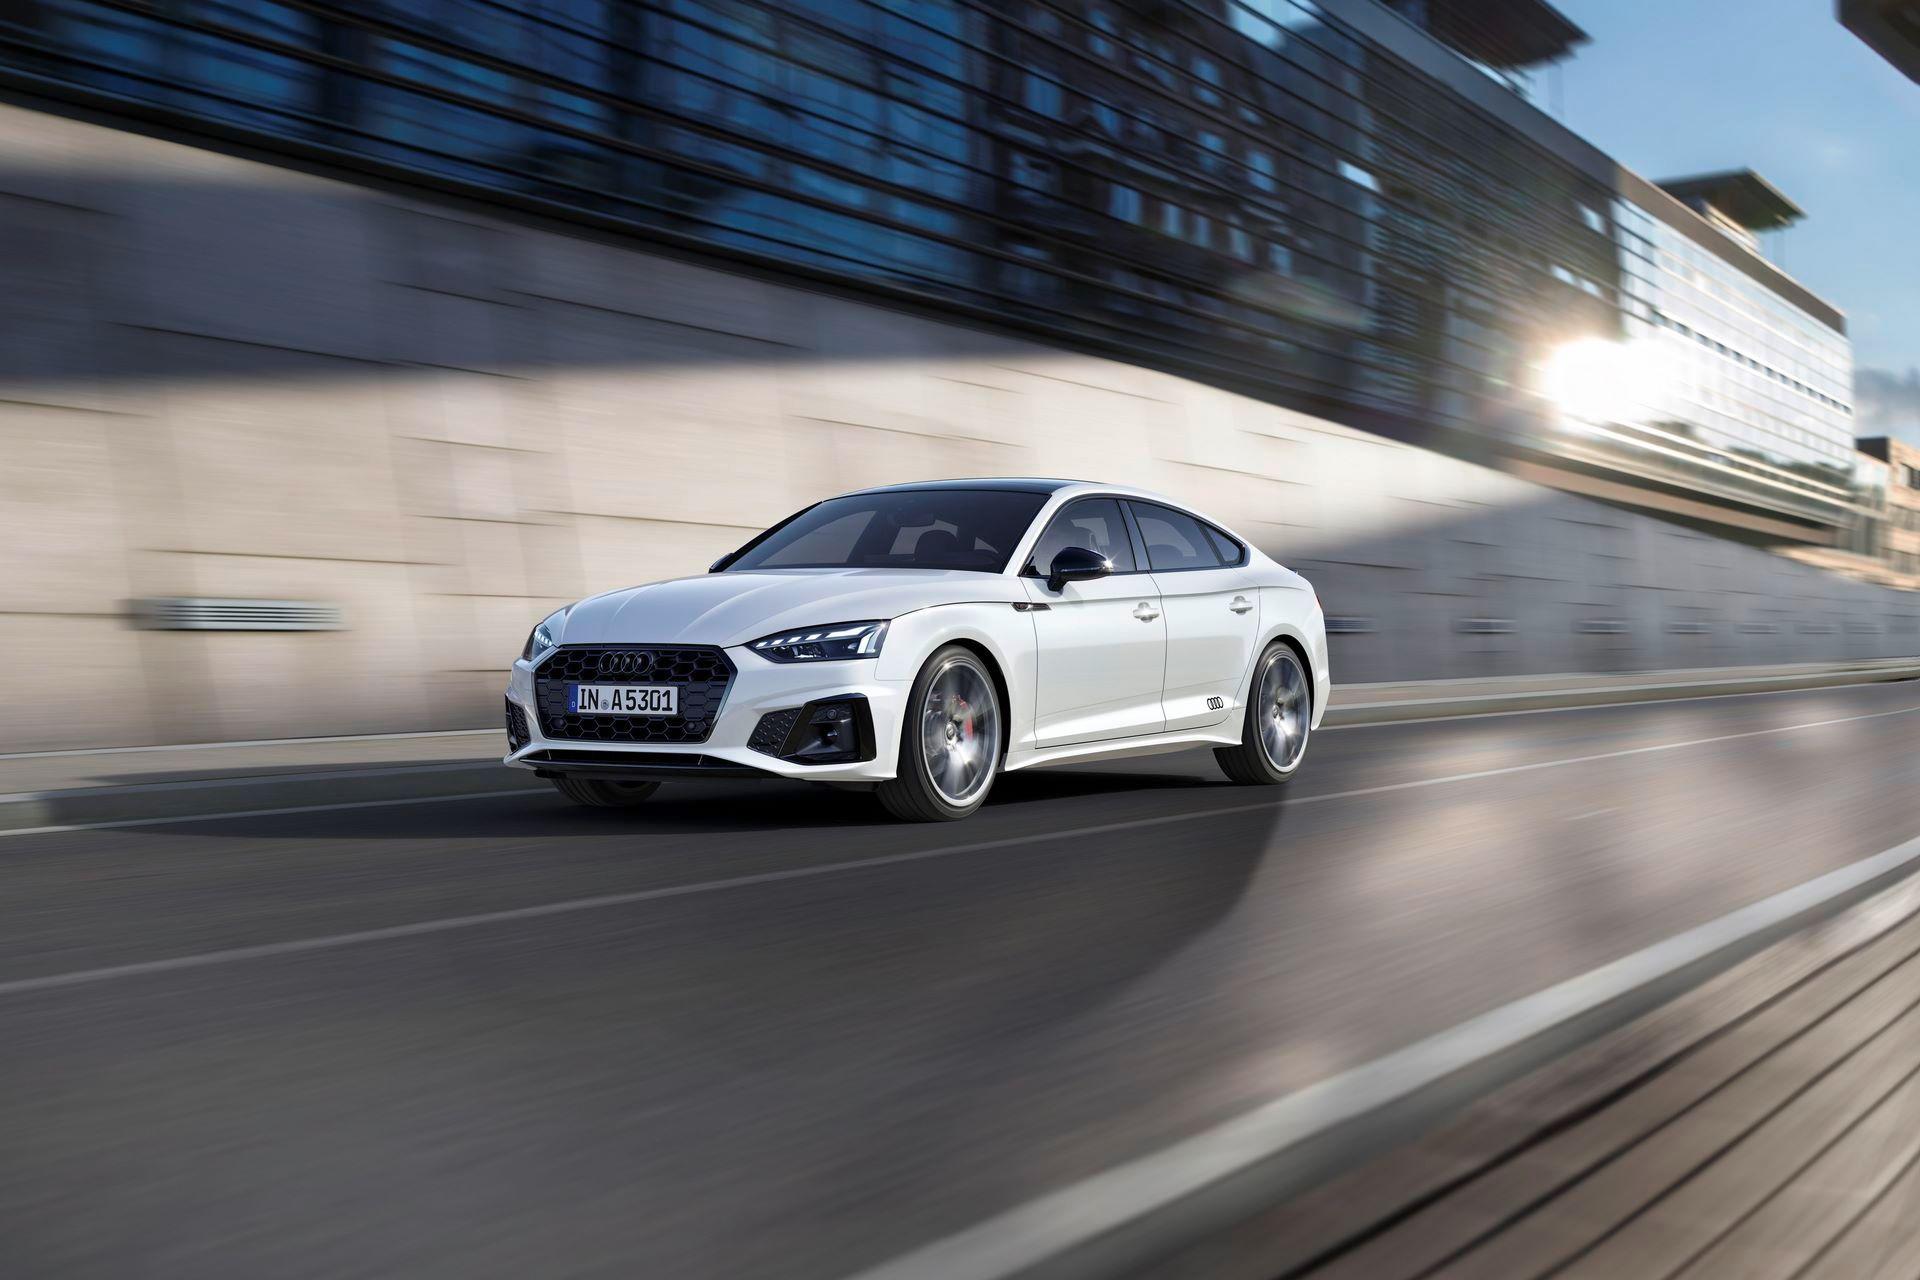 Audi-A4-A5-Q7-Q8-Competition-And-Competition-Plus-Trims-68